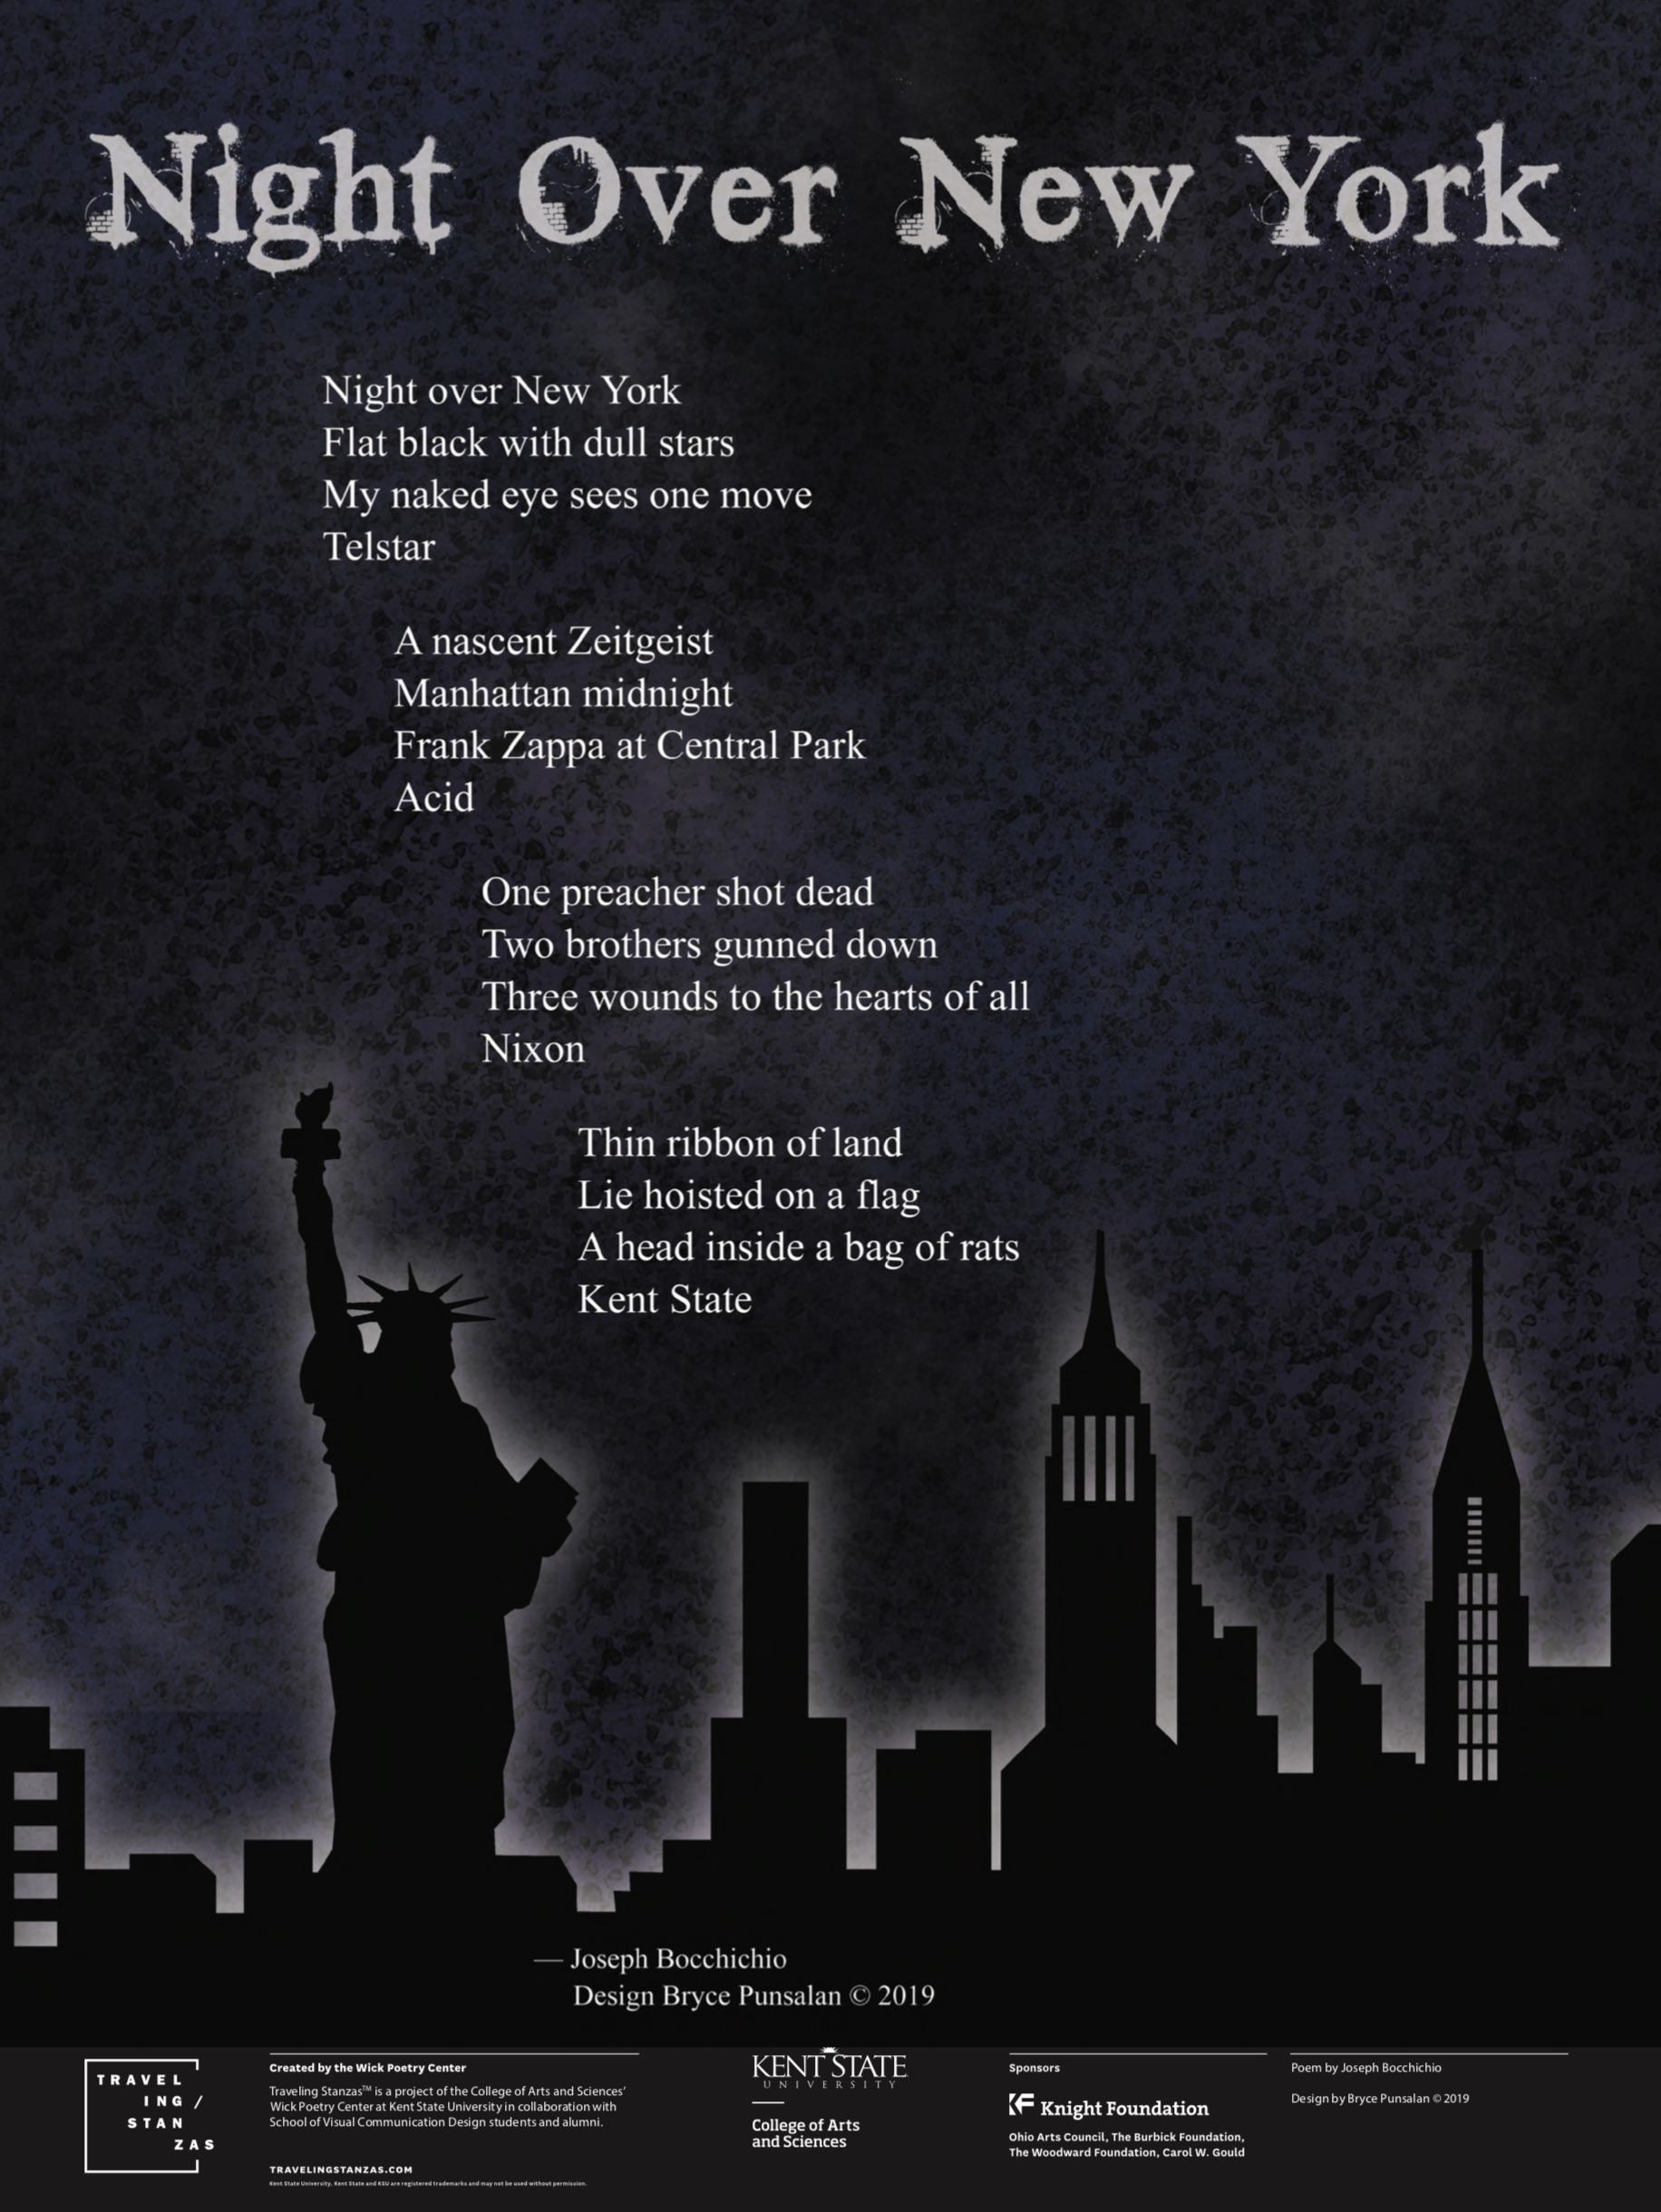 Night Over New York